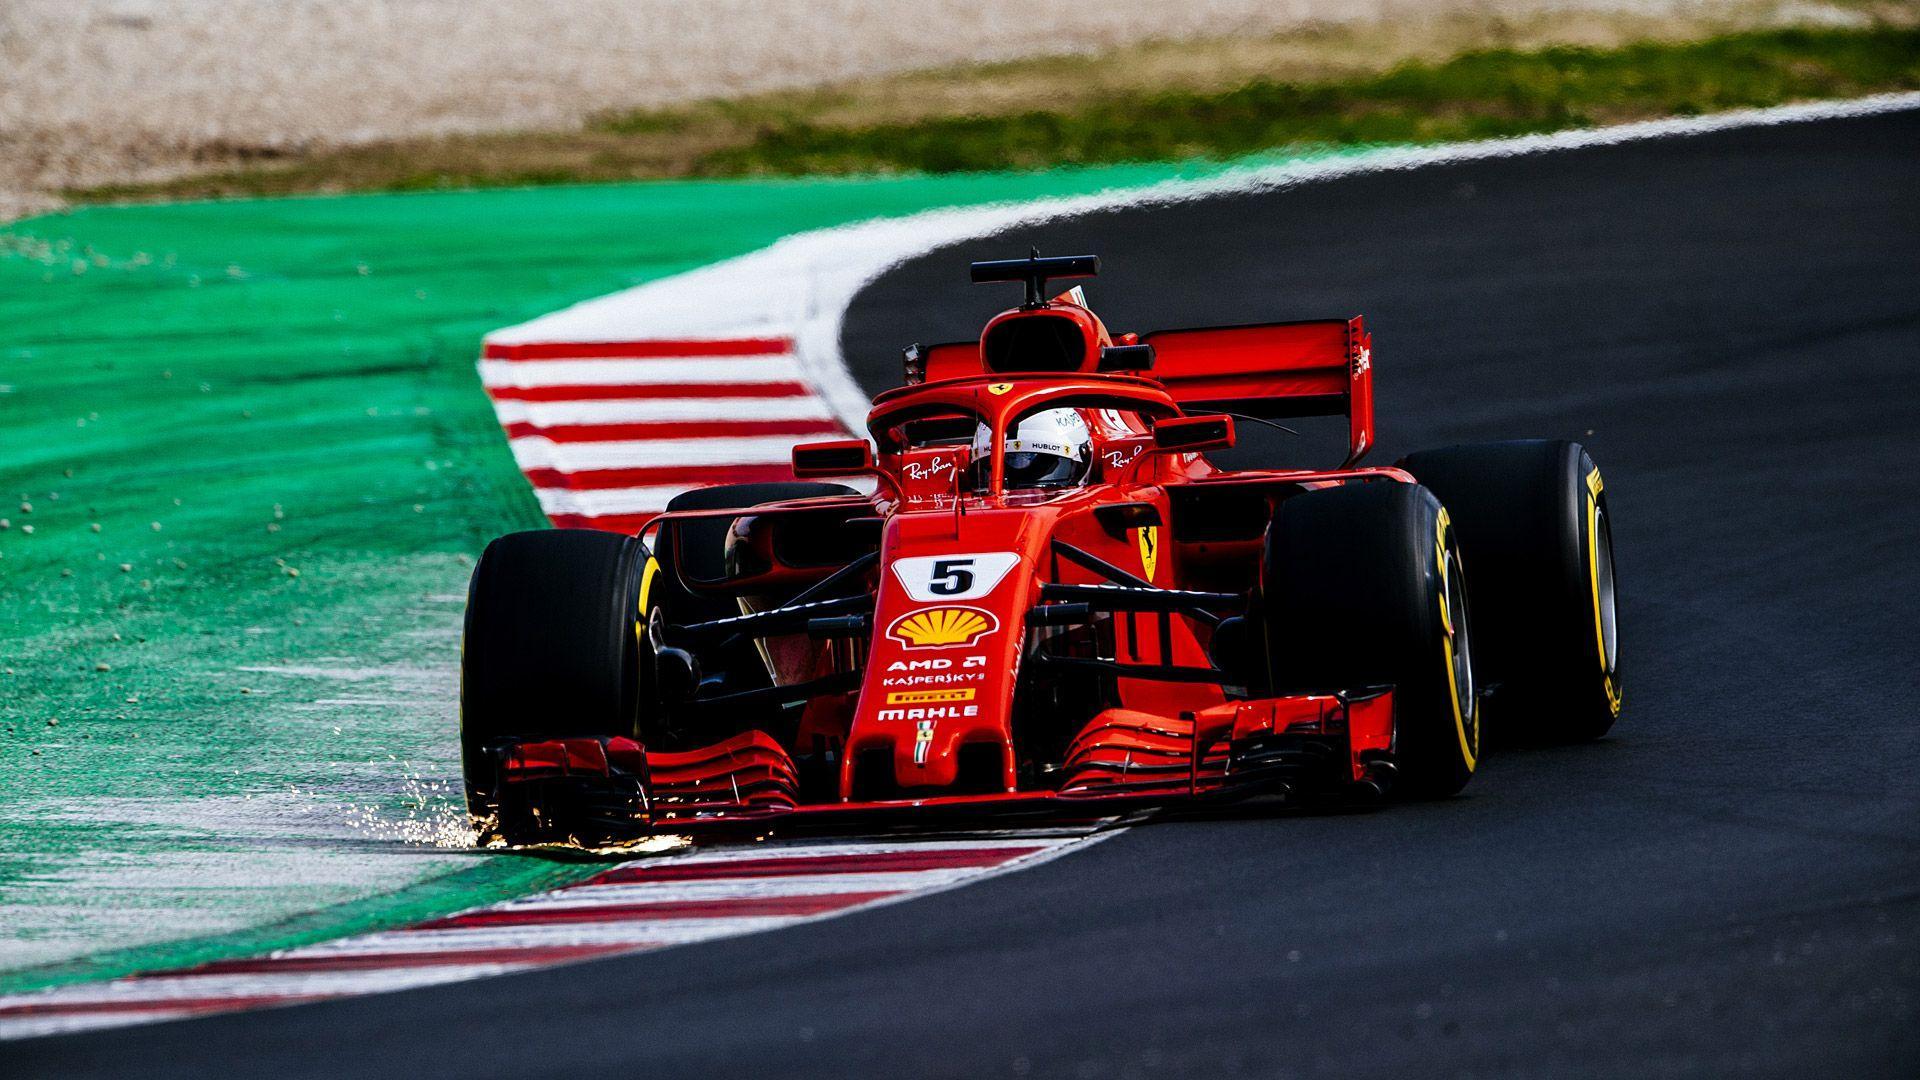 Ferrari F1 2018 Wallpapers Top Free Ferrari F1 2018 Backgrounds Wallpaperaccess